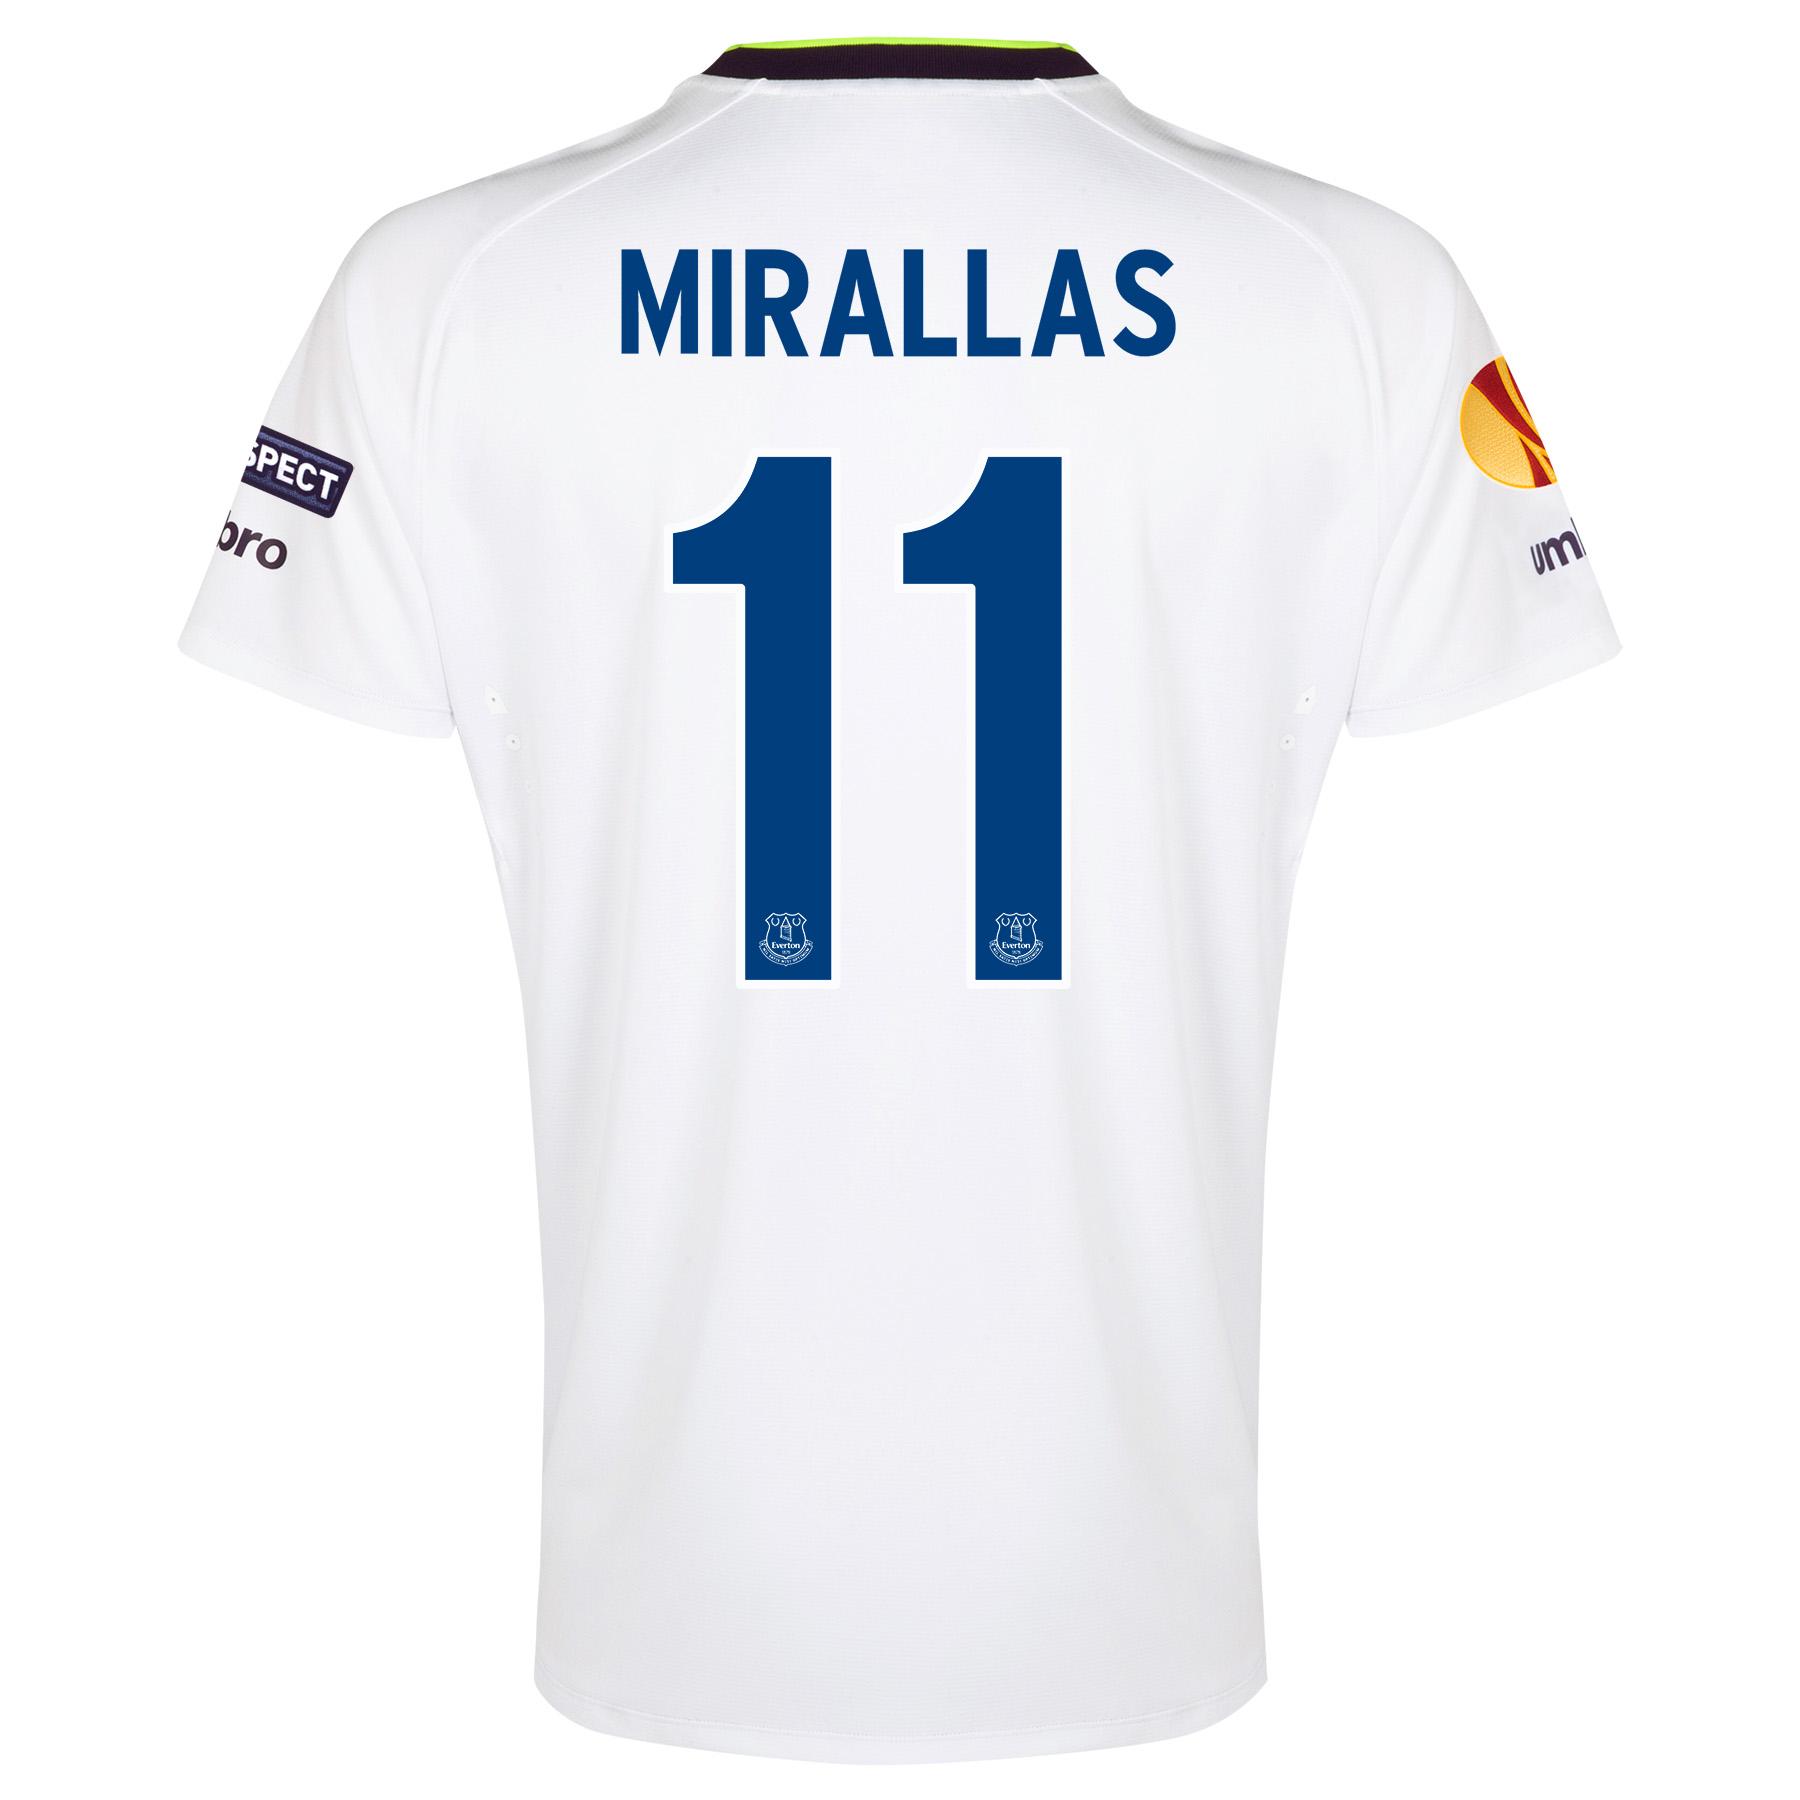 Everton UEFA Europa League 3rd Shirt 2014/15 with Mirallas 11 printing